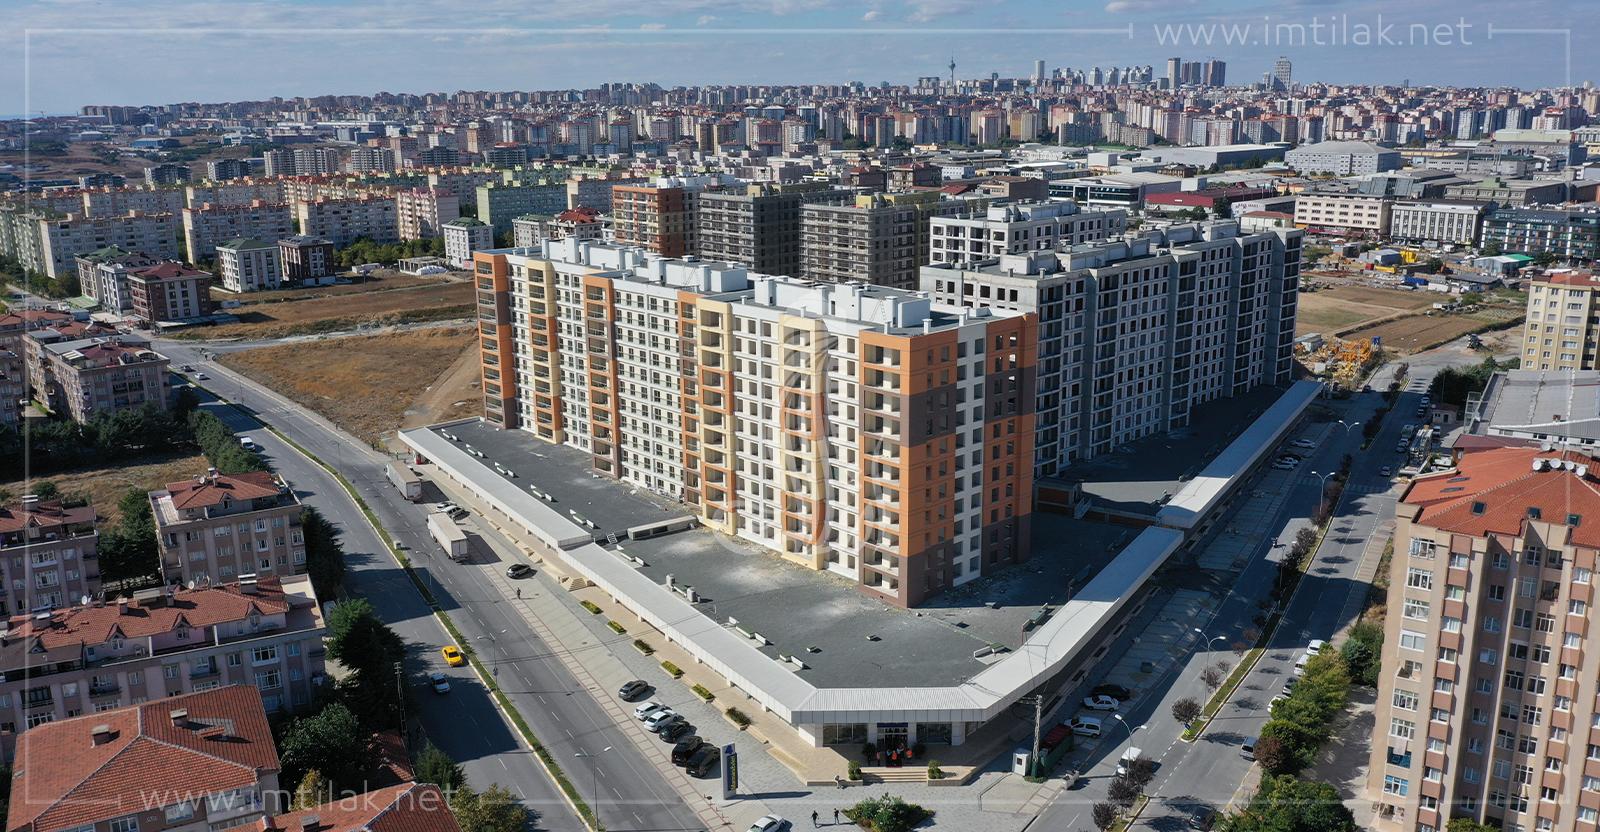 مشروع مساكن مرمرة (4)  IMT-172